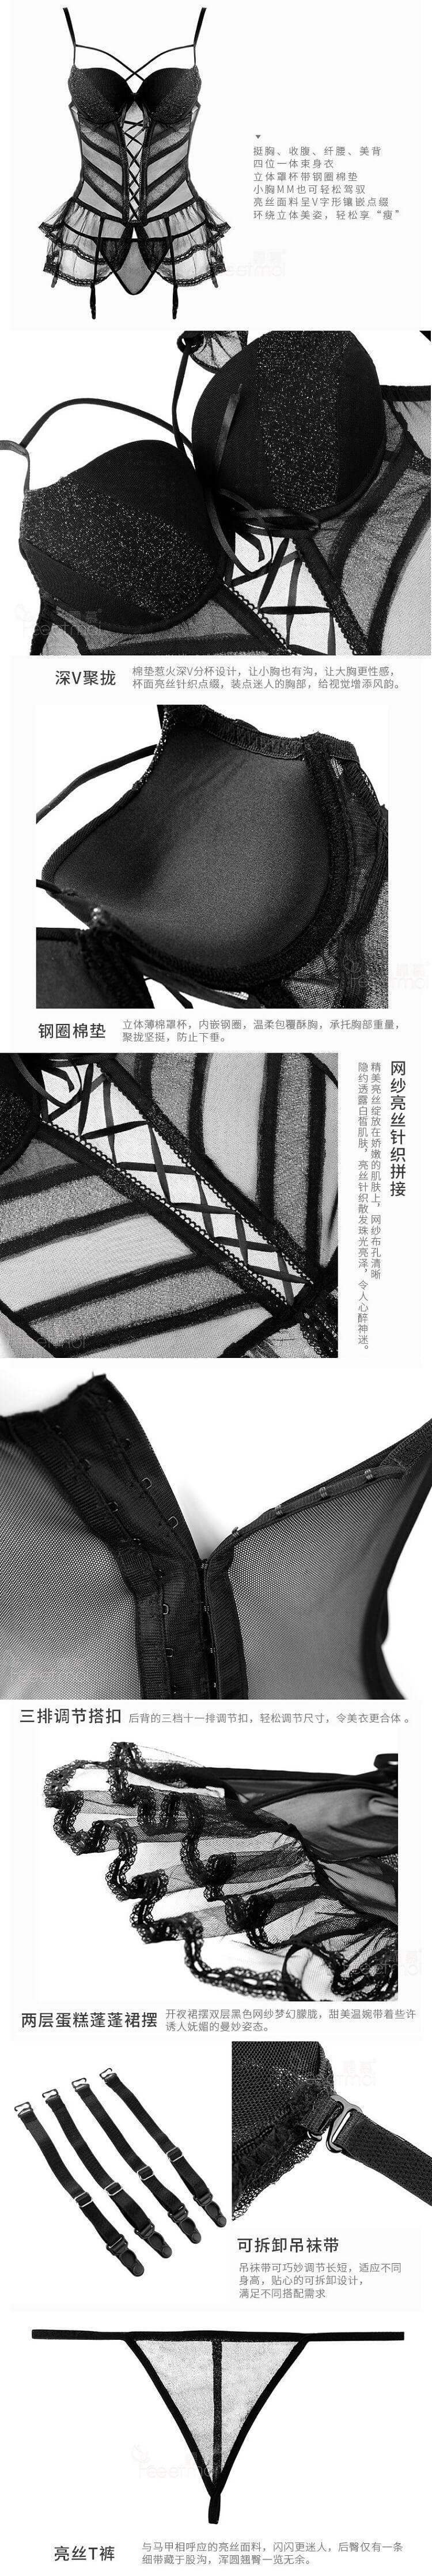 Sexy Corset with Garter Belts SC026